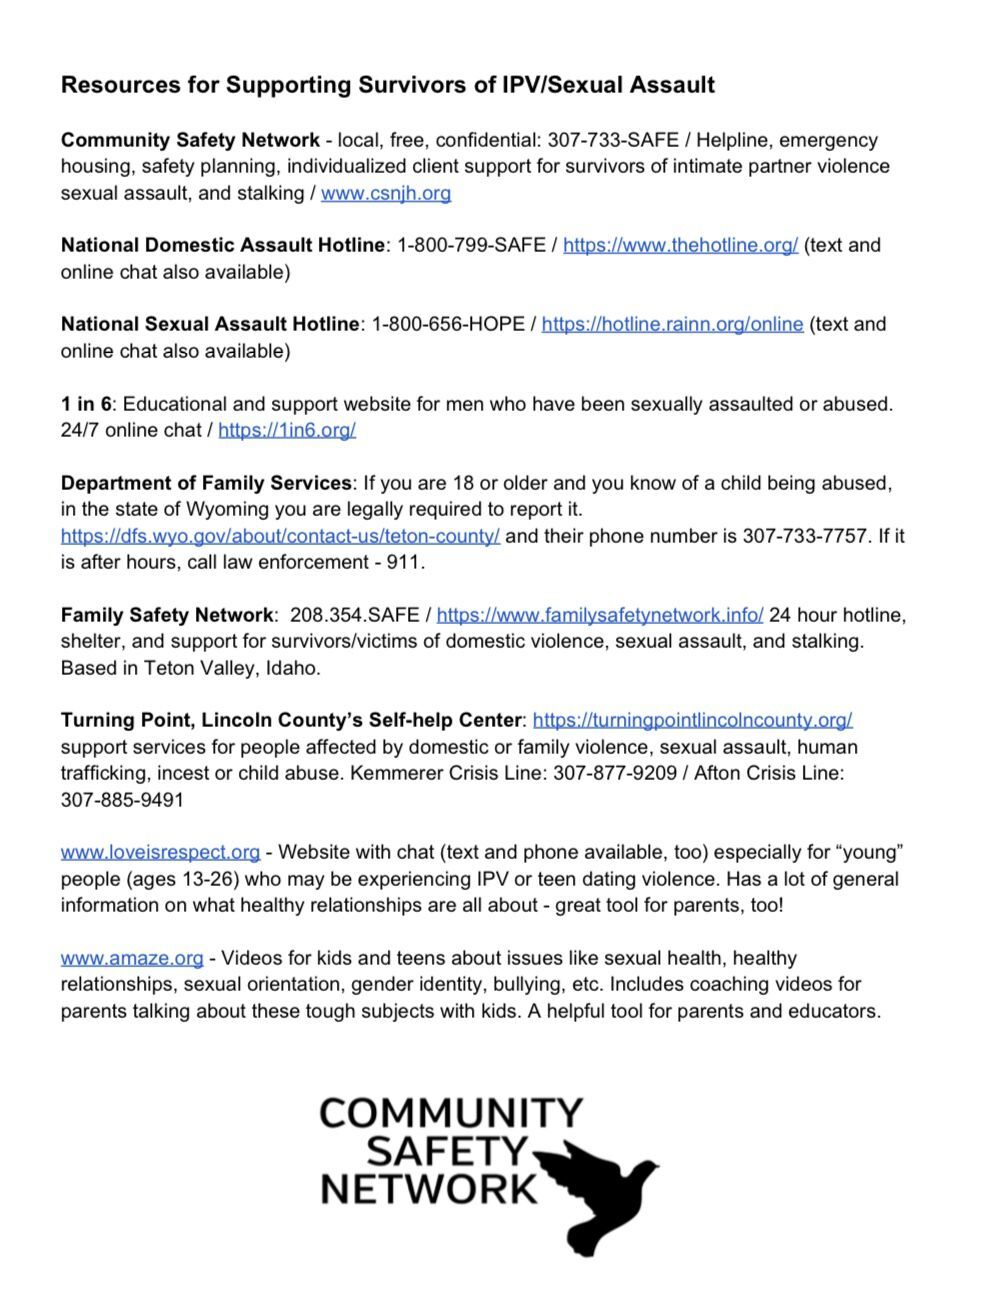 Resource list by CSN